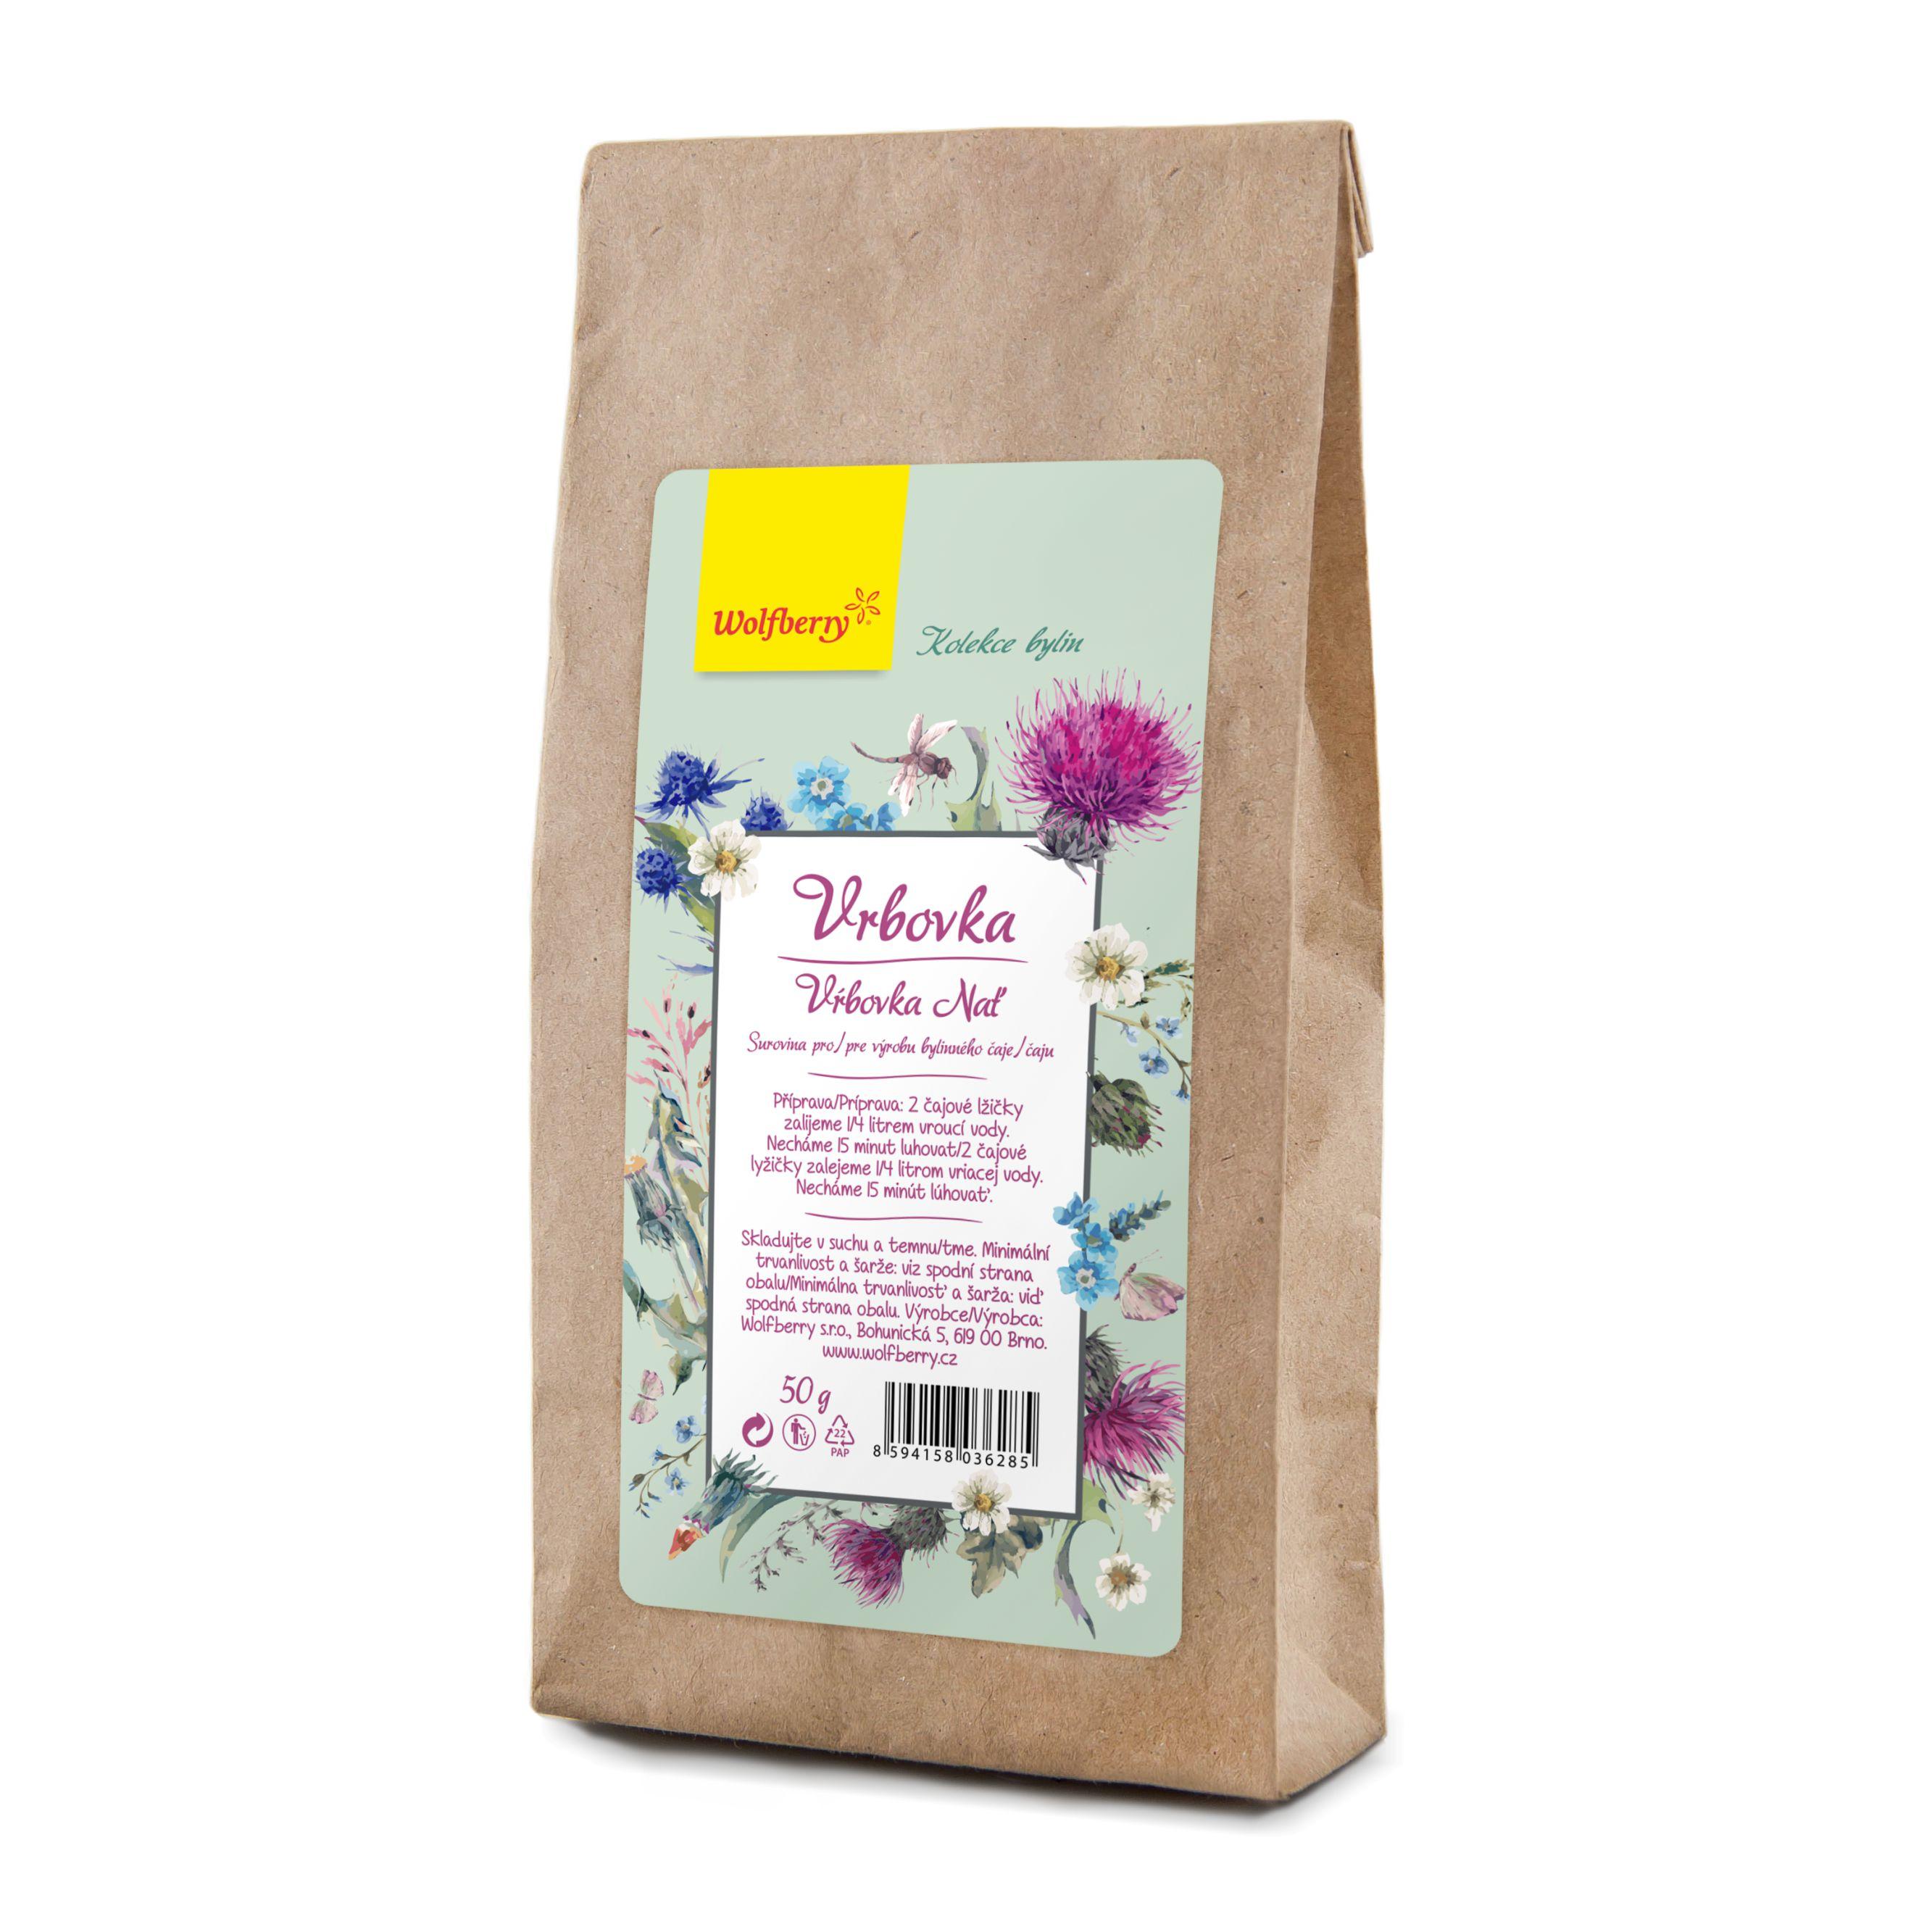 Wolfberry Vrbovka vňať bylinný čaj 50 g Wolfberry 50 g